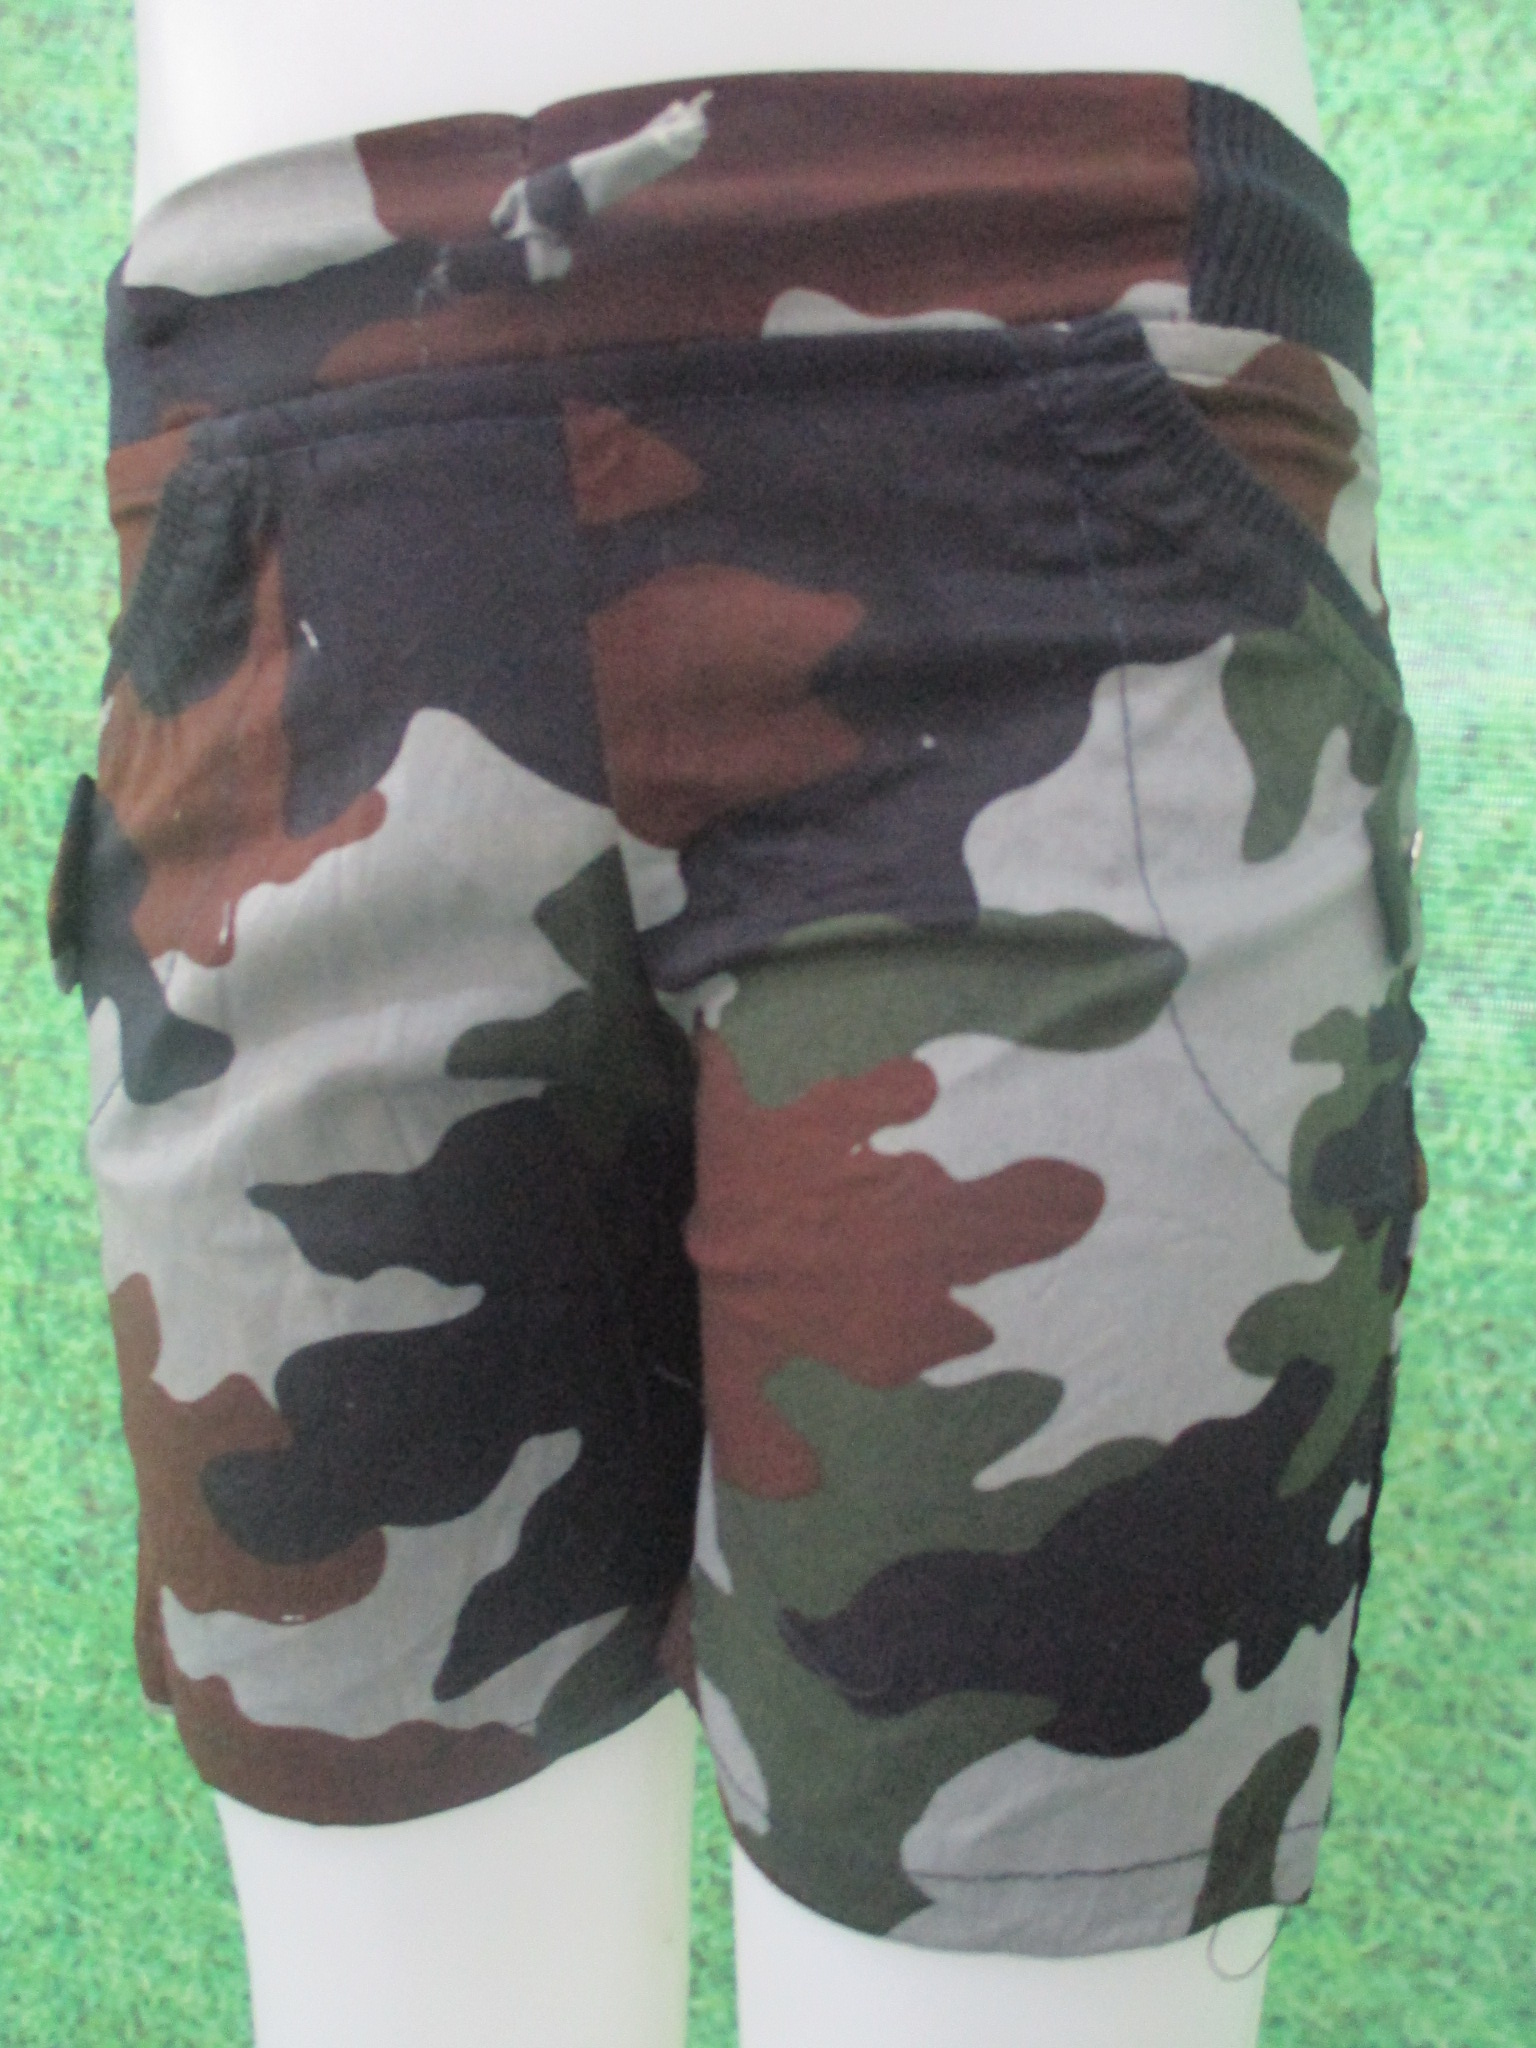 ObralanBaju.com Celana Hotpan Anak